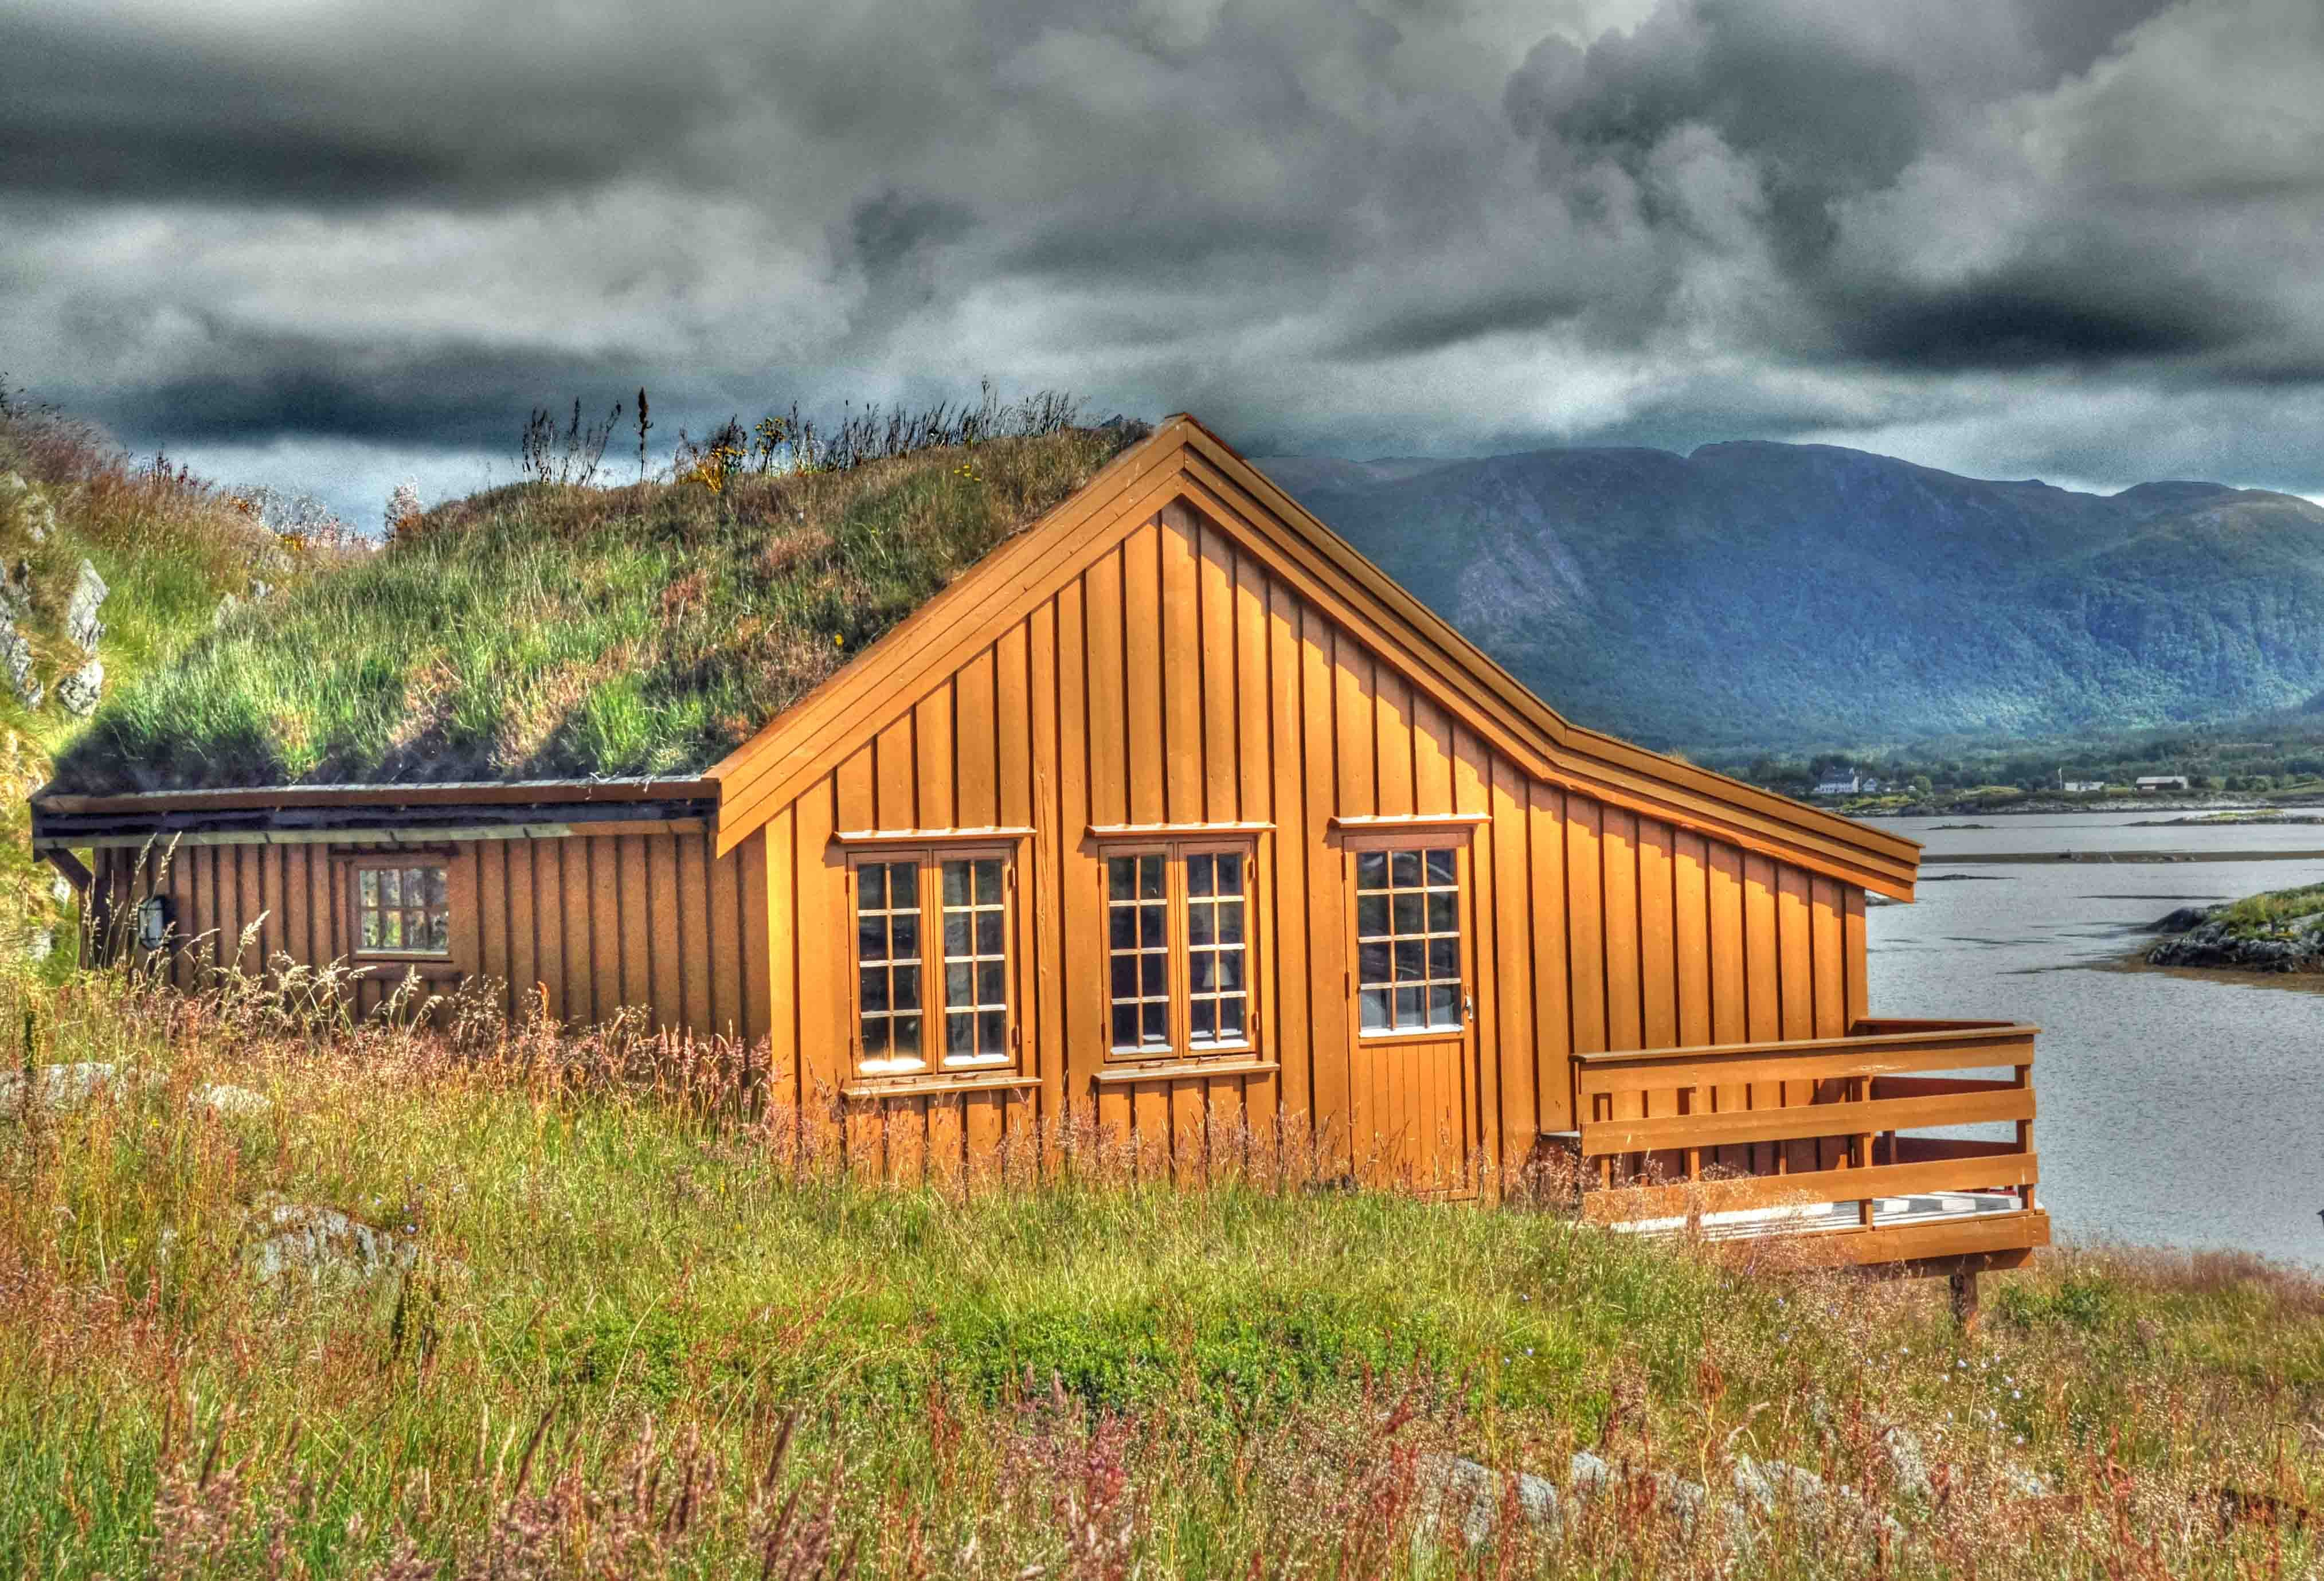 Free stock photo of dwelling, house, timber hut